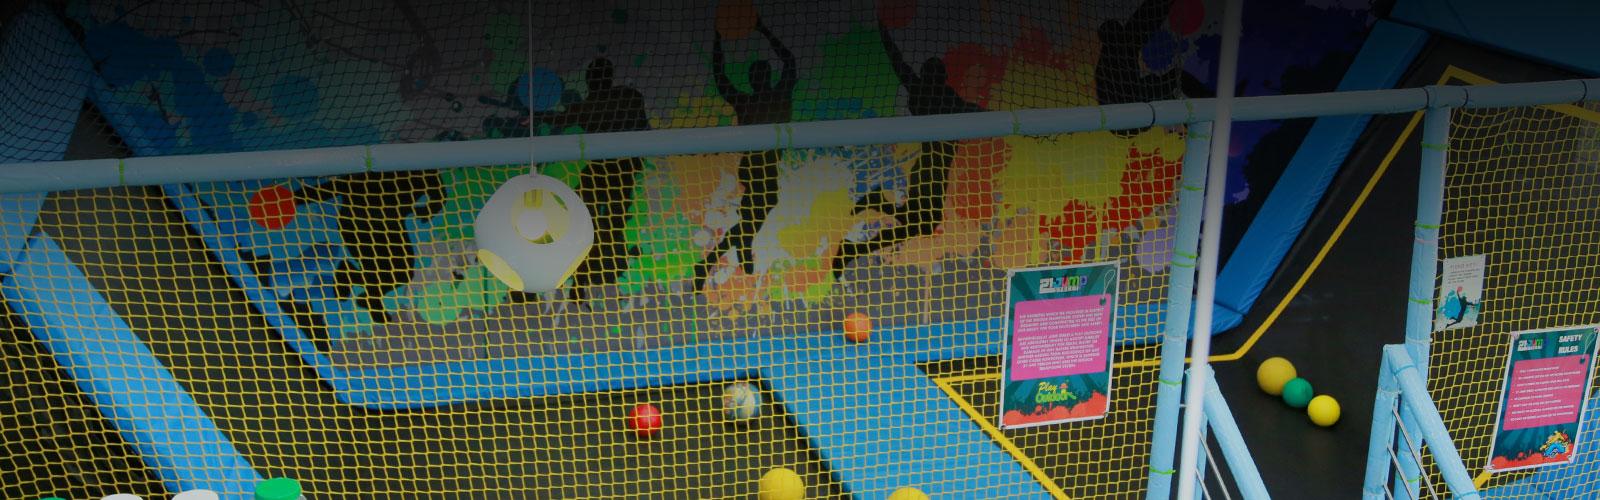 21 Jump Street | Trampoline Park